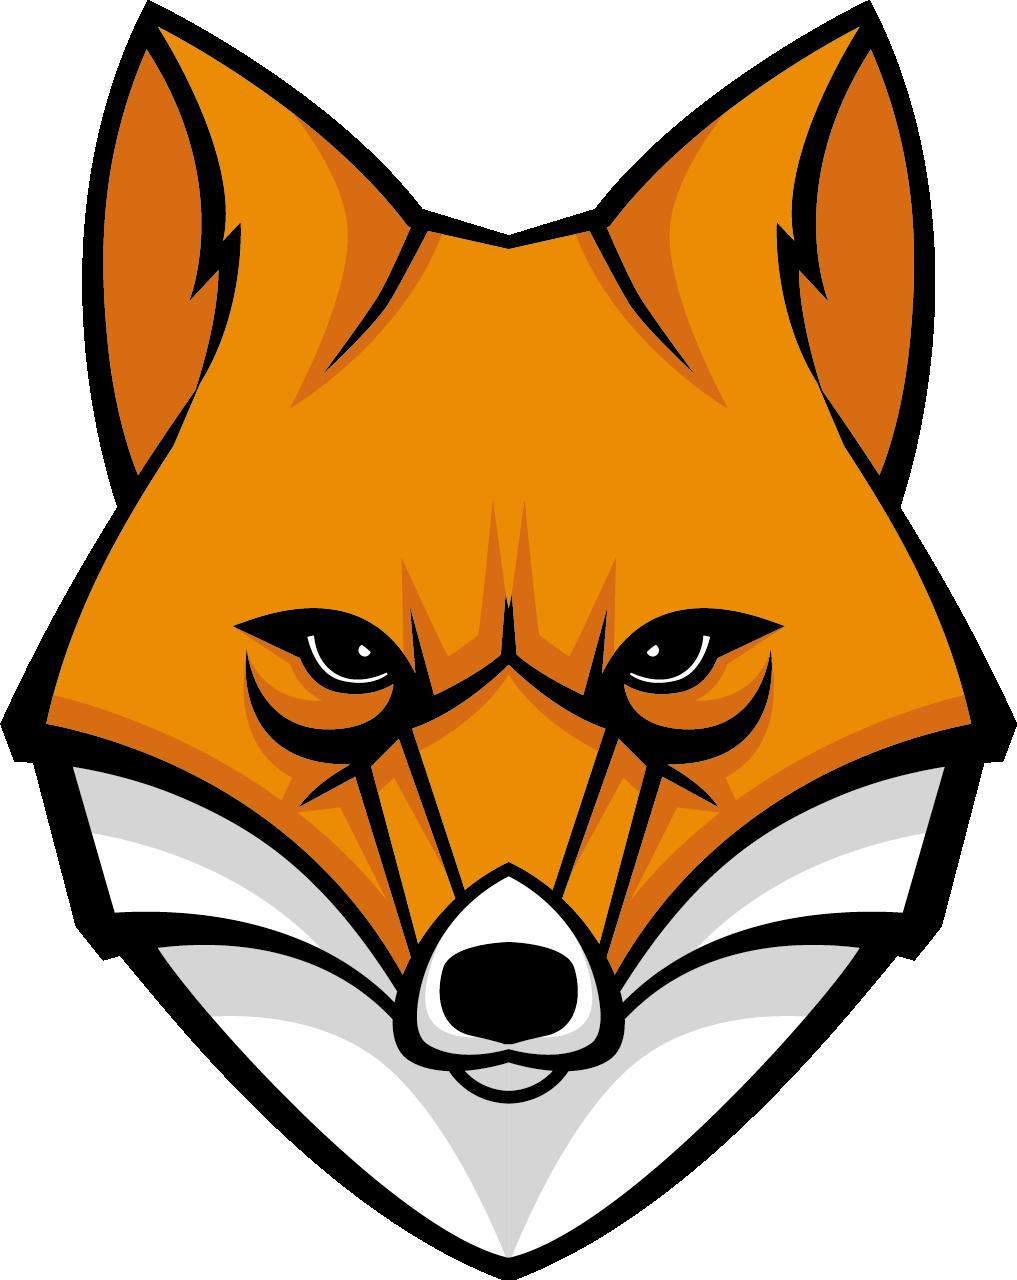 Head at getdrawings com. Nose clipart fox